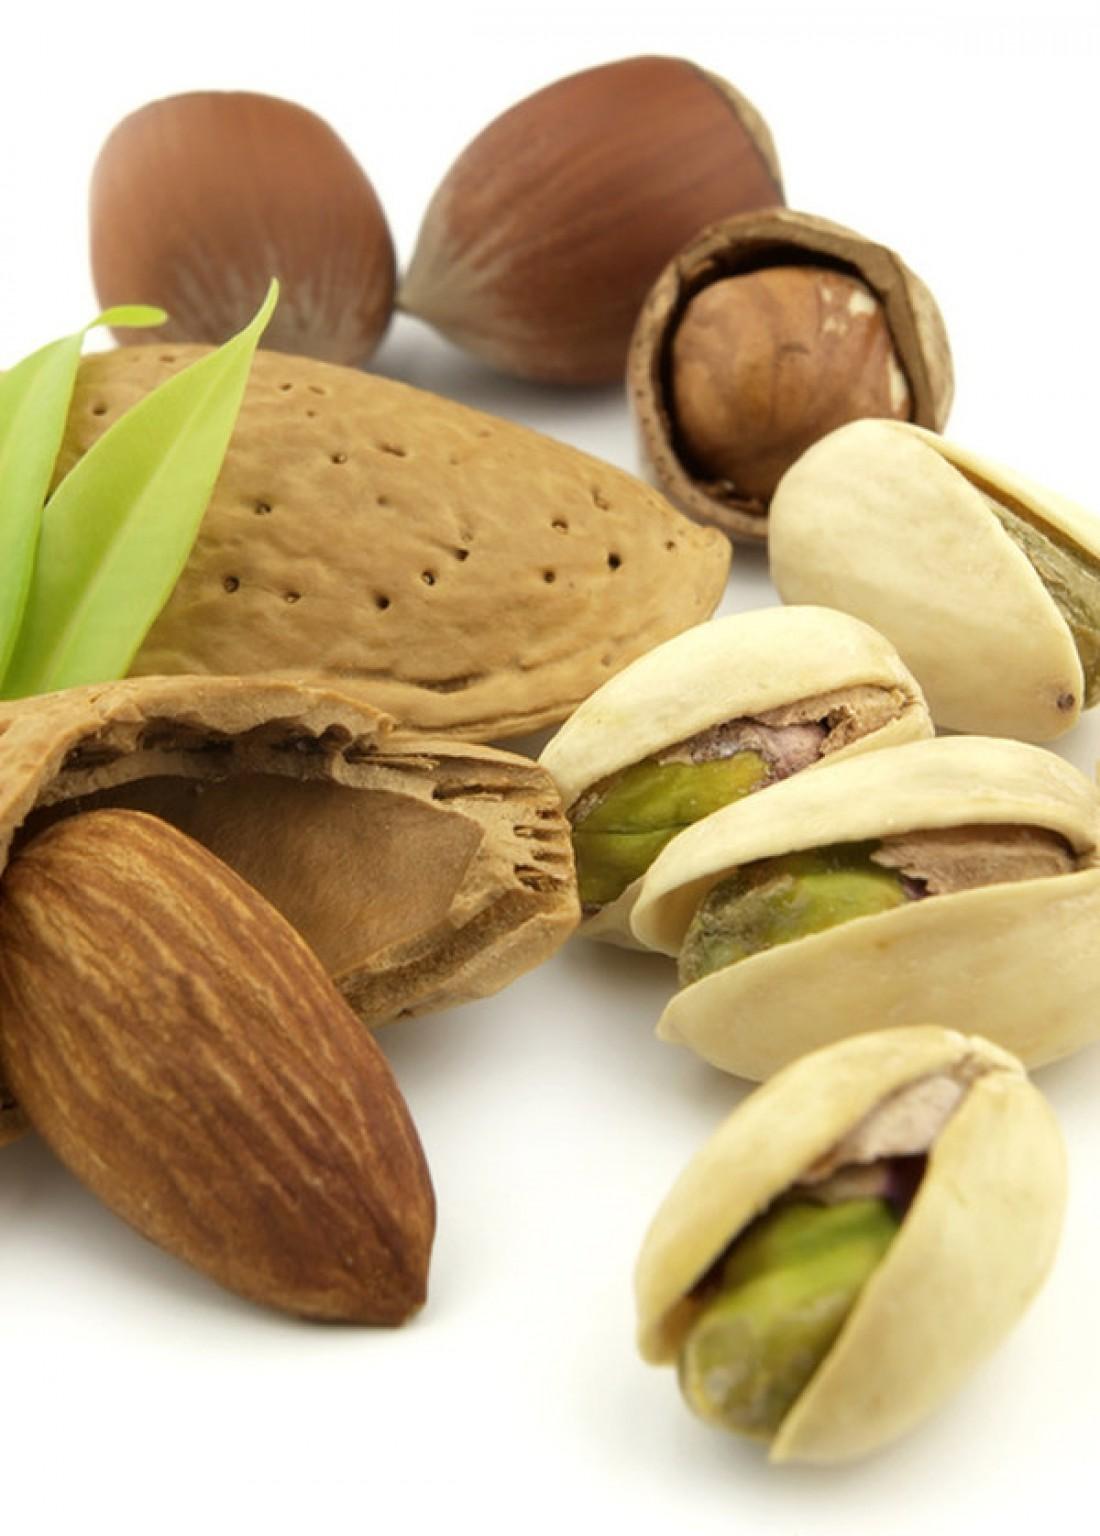 Орехи и семечки снимают судороги